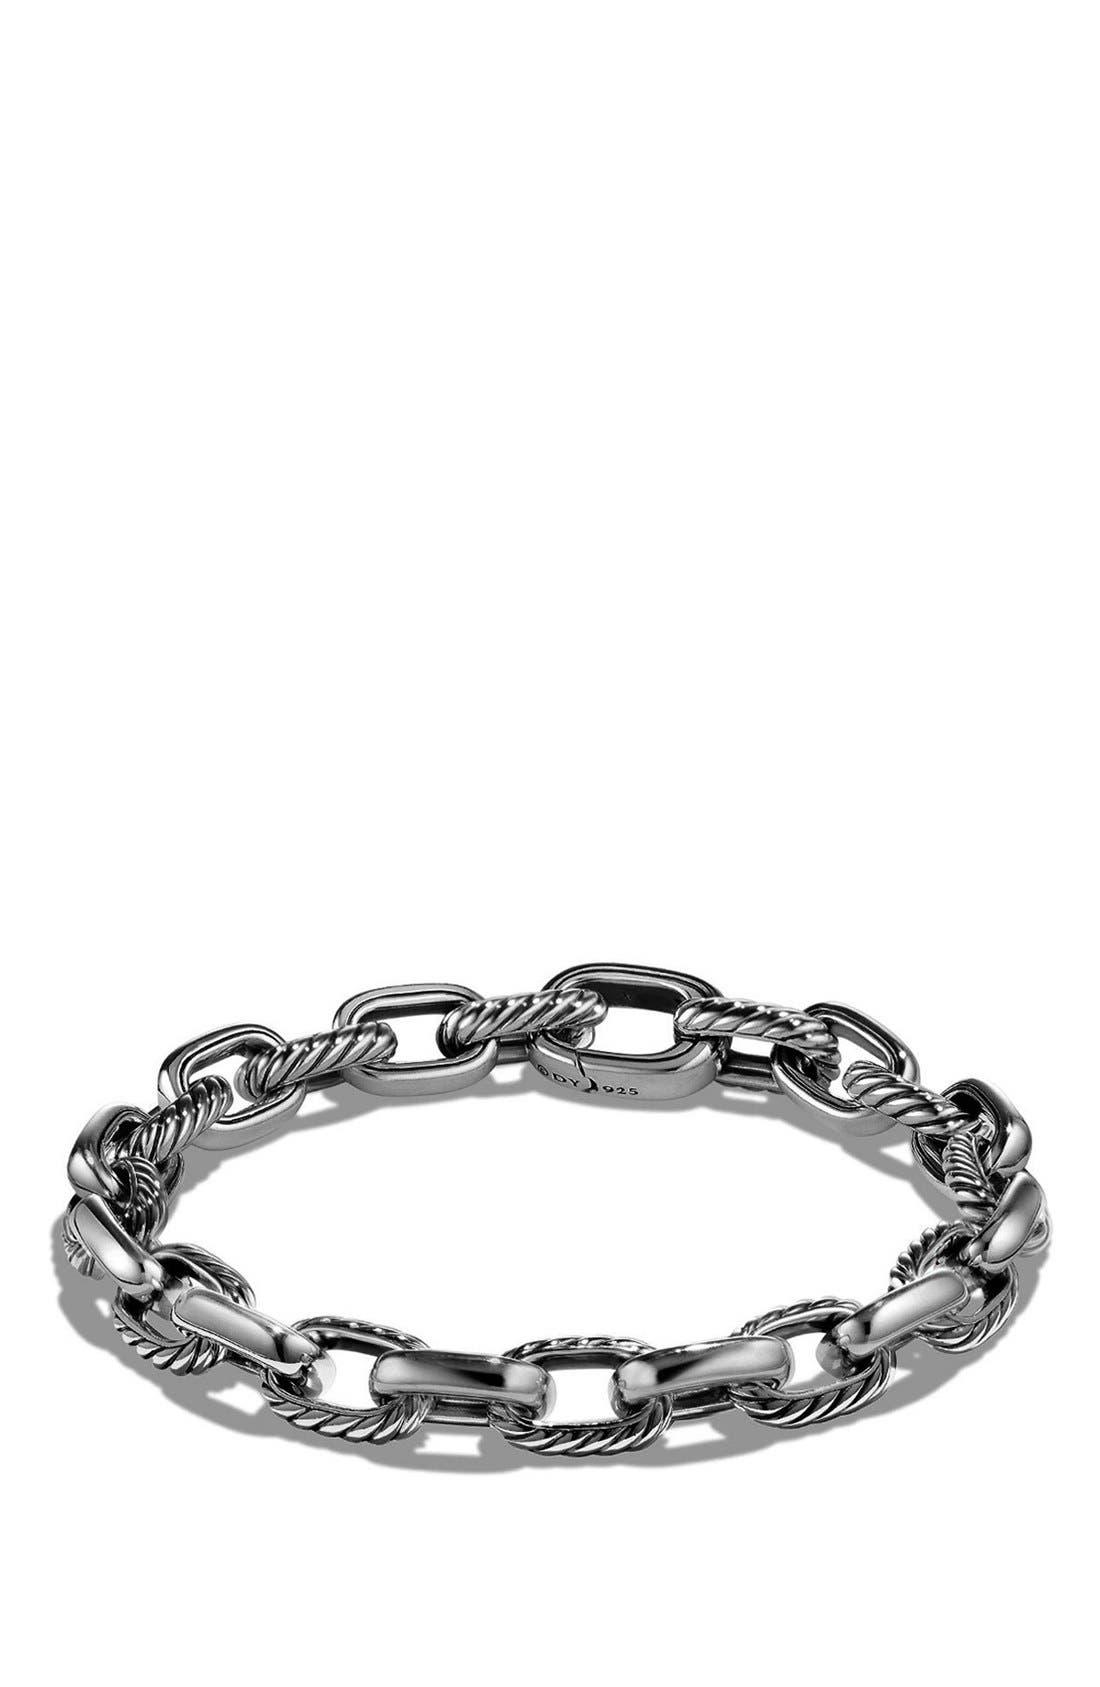 Main Image - David Yurman 'Cable Classics' Oval Link Bracelet